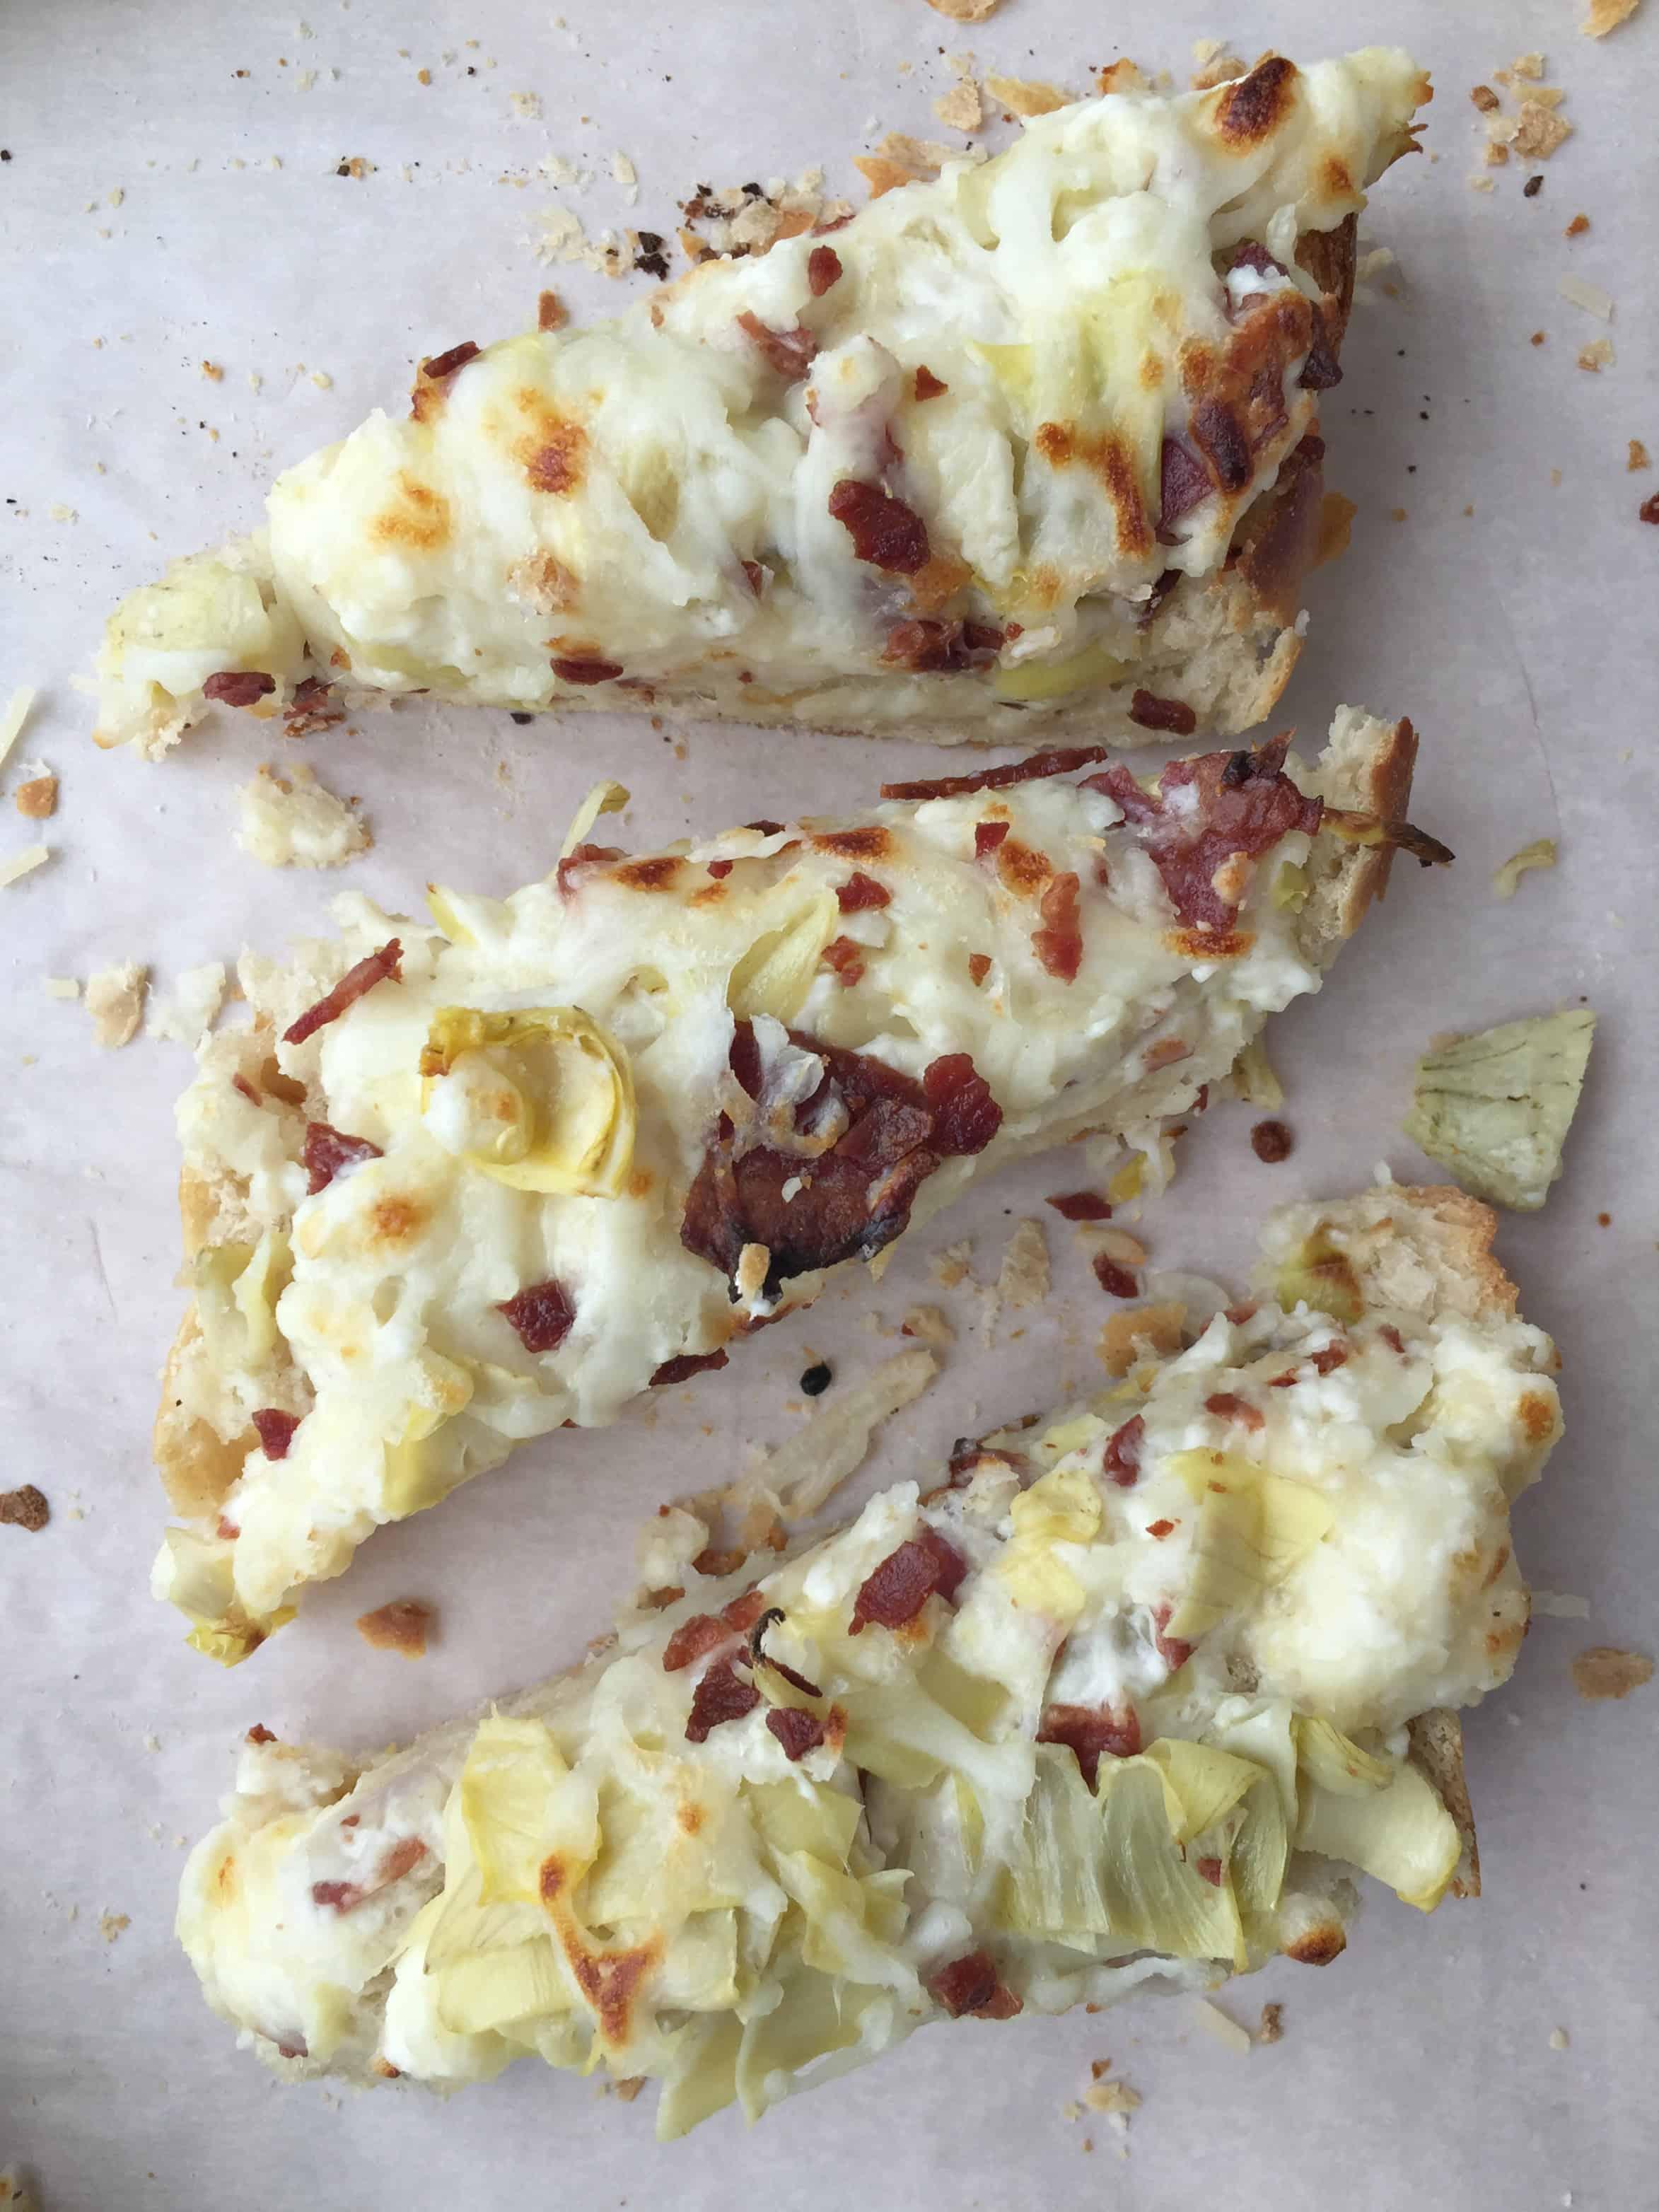 Asiago Artichoke French Bread Pizza w. Bacon